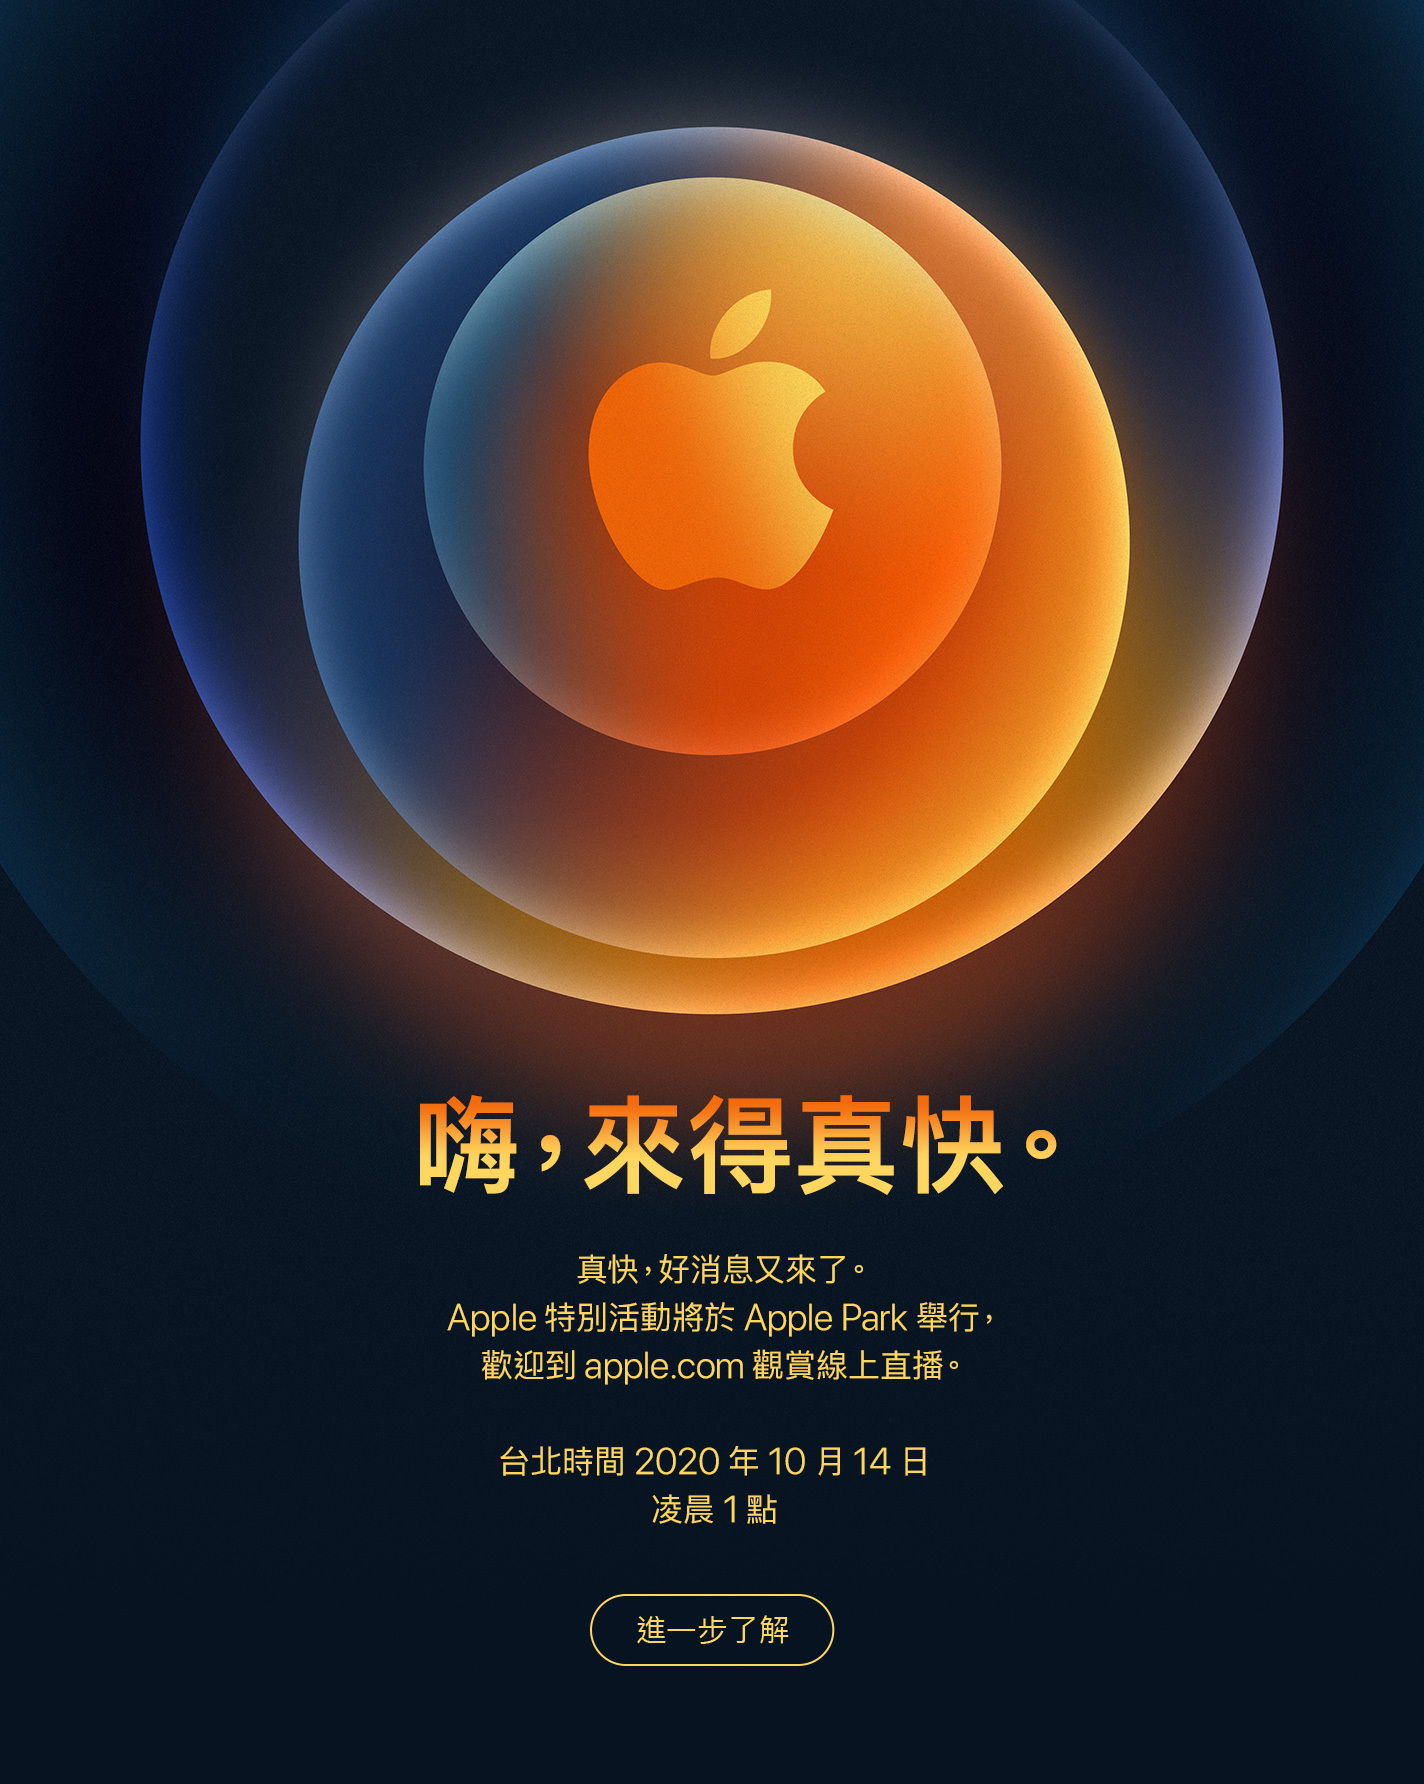 iPhone 12 確定發表!?蘋果公佈 2020 年 10 月最新 Apple Event